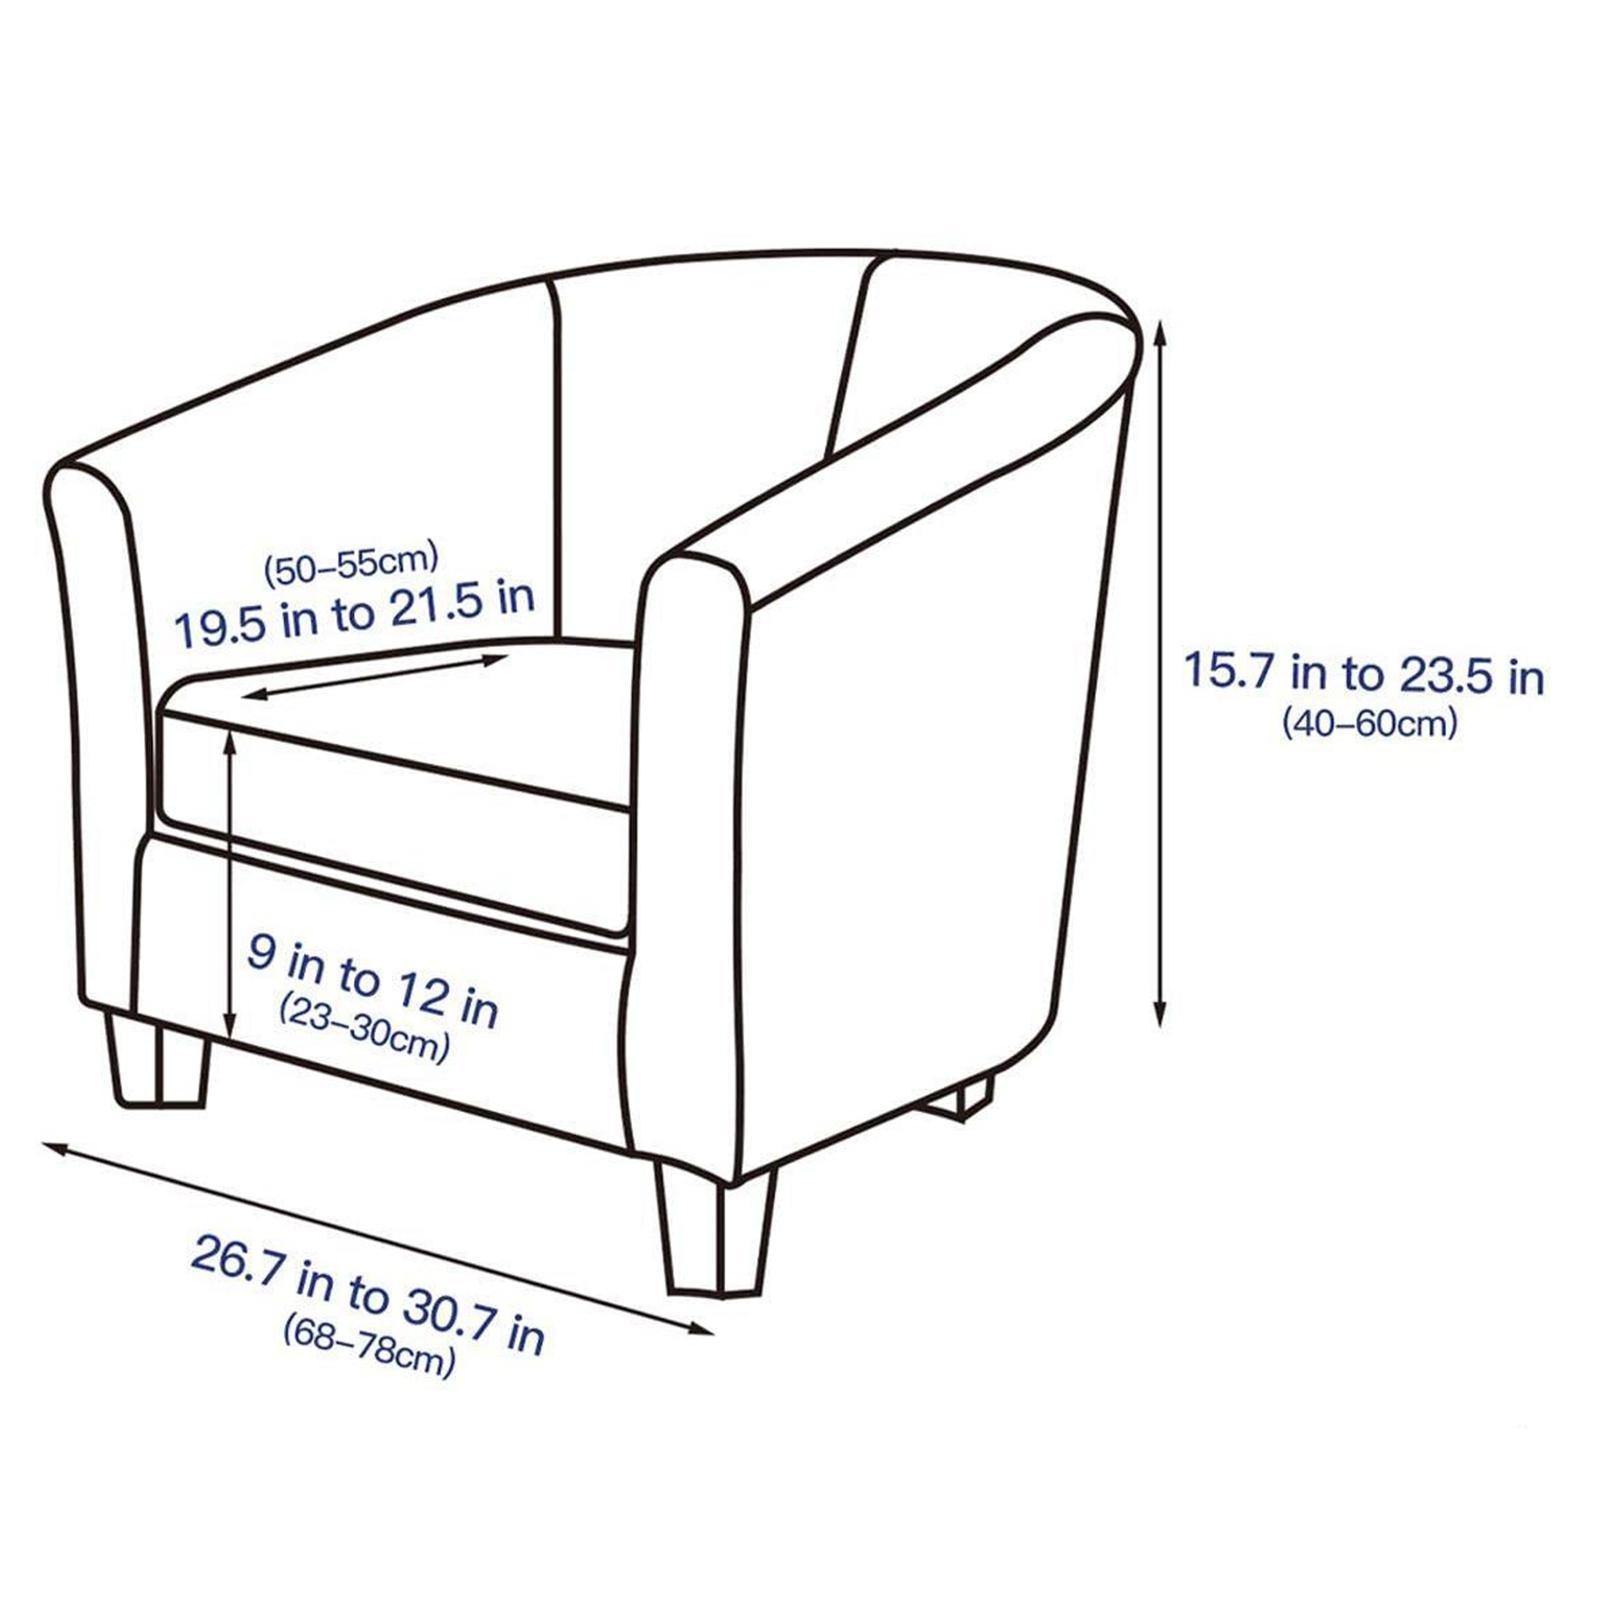 miniatura 18 - Fodera per poltrona singola per poltrona Fodera per sedia in colori assortiti